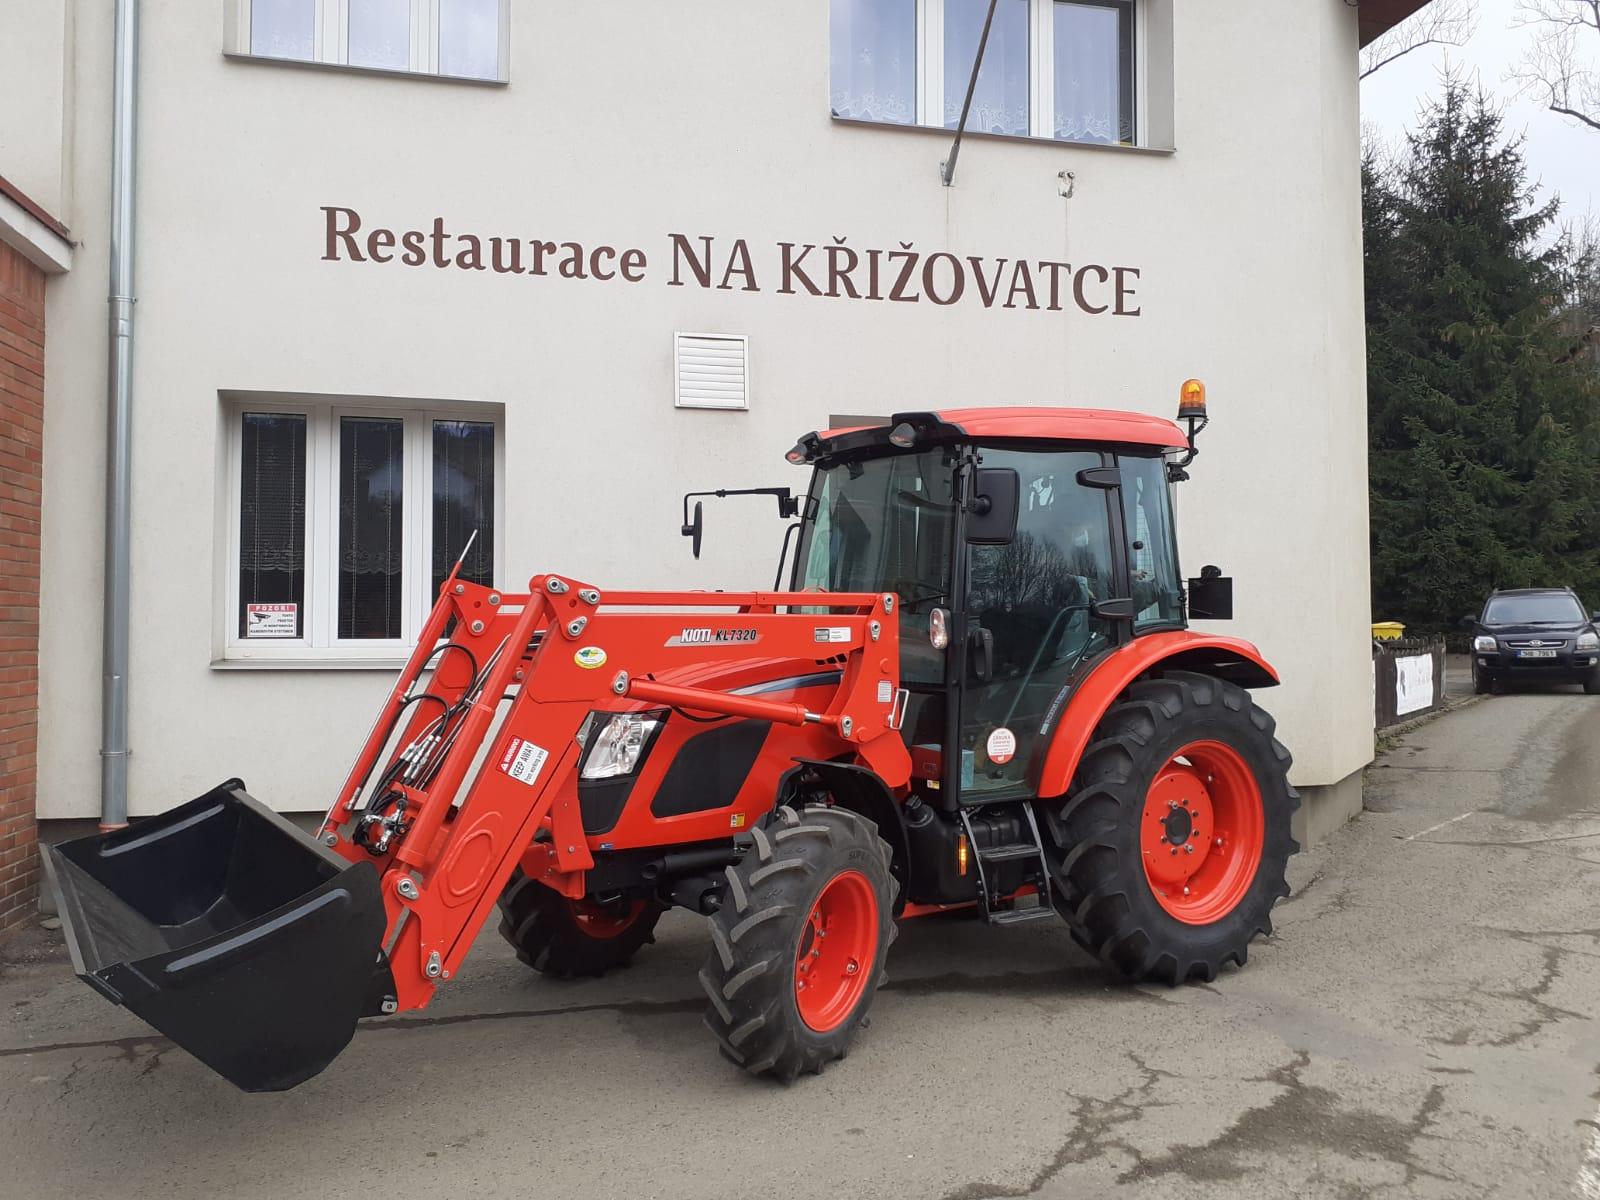 Kioti-RX7330PC-GE-Premium-Ceska-Metuje2.jpeg